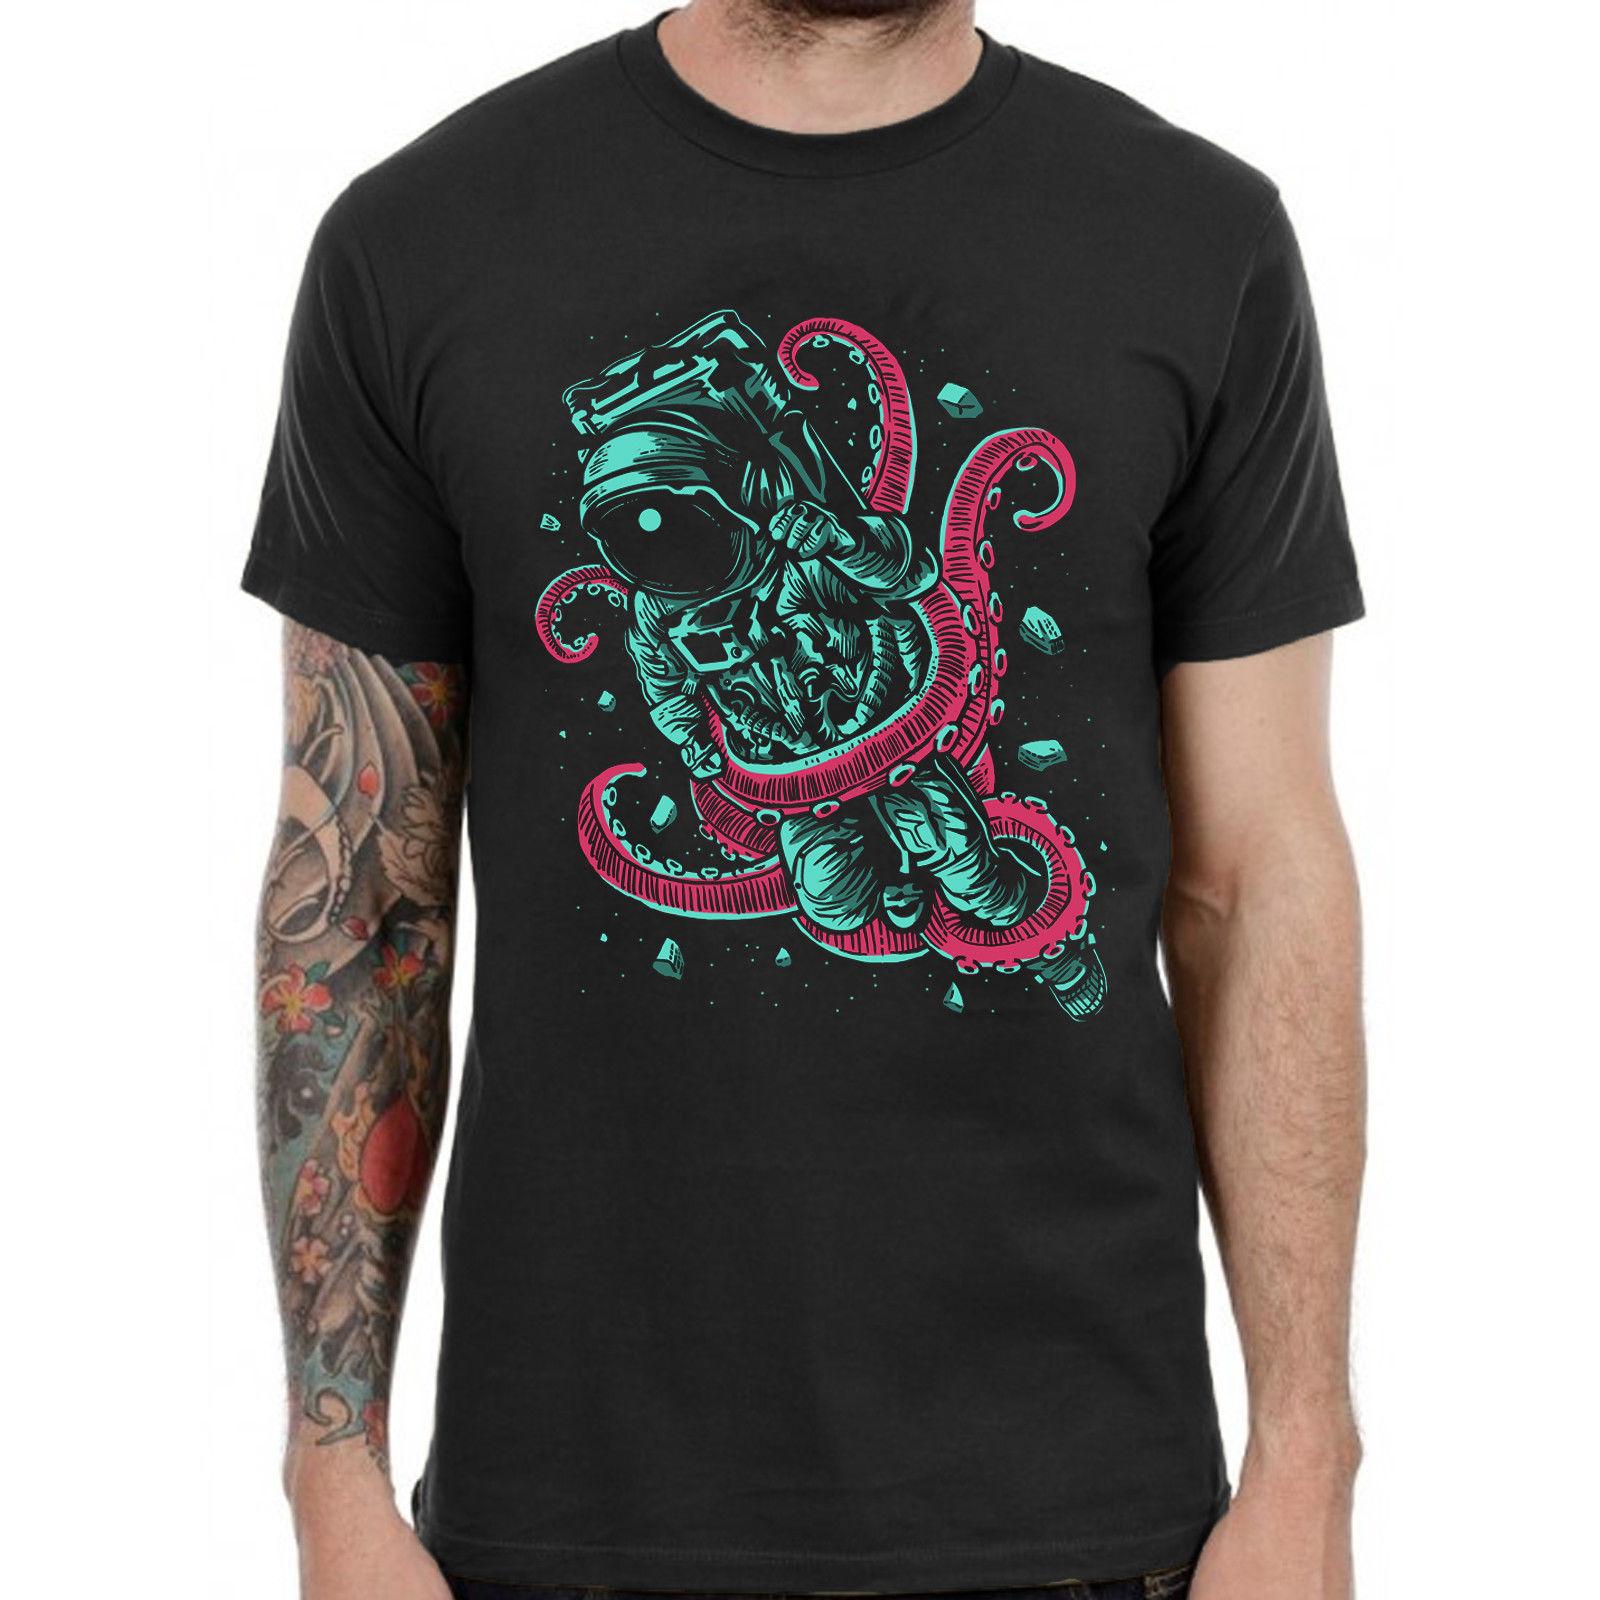 Astronaut Octopus Graphic T Shirt Retro Print Trippy Band DJ Dead Men Top Punk